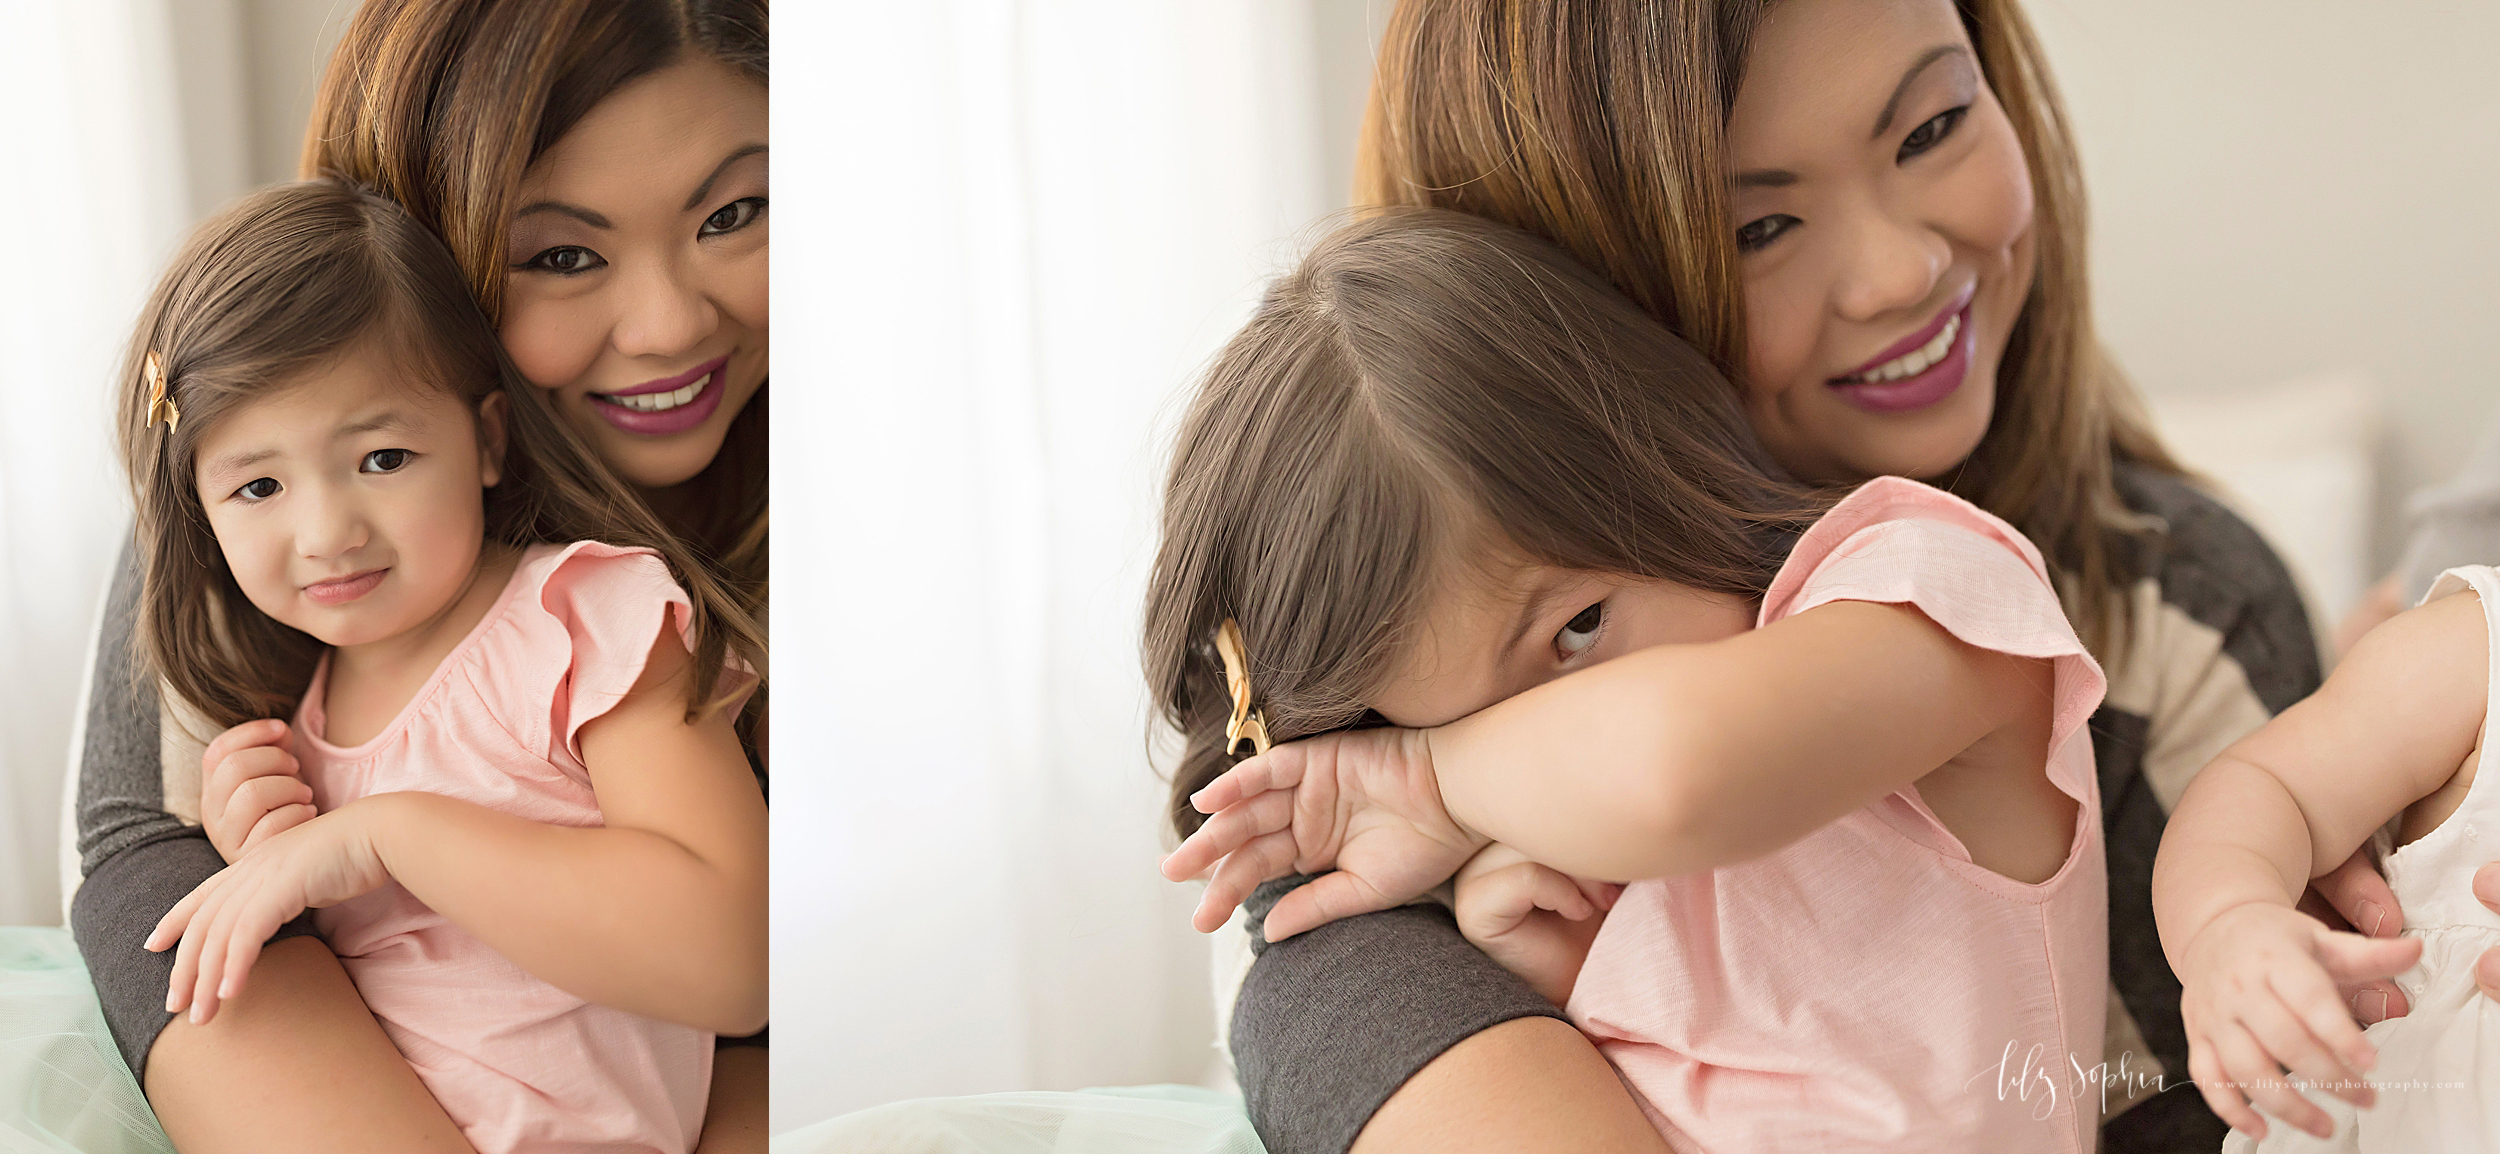 atlanta-midtown-brookhaven-decatur-lily-sophia-photography-photographer-portraits-grant-park-studio-six-month-milestone-baby-girl-big-sister-family_0113.jpg